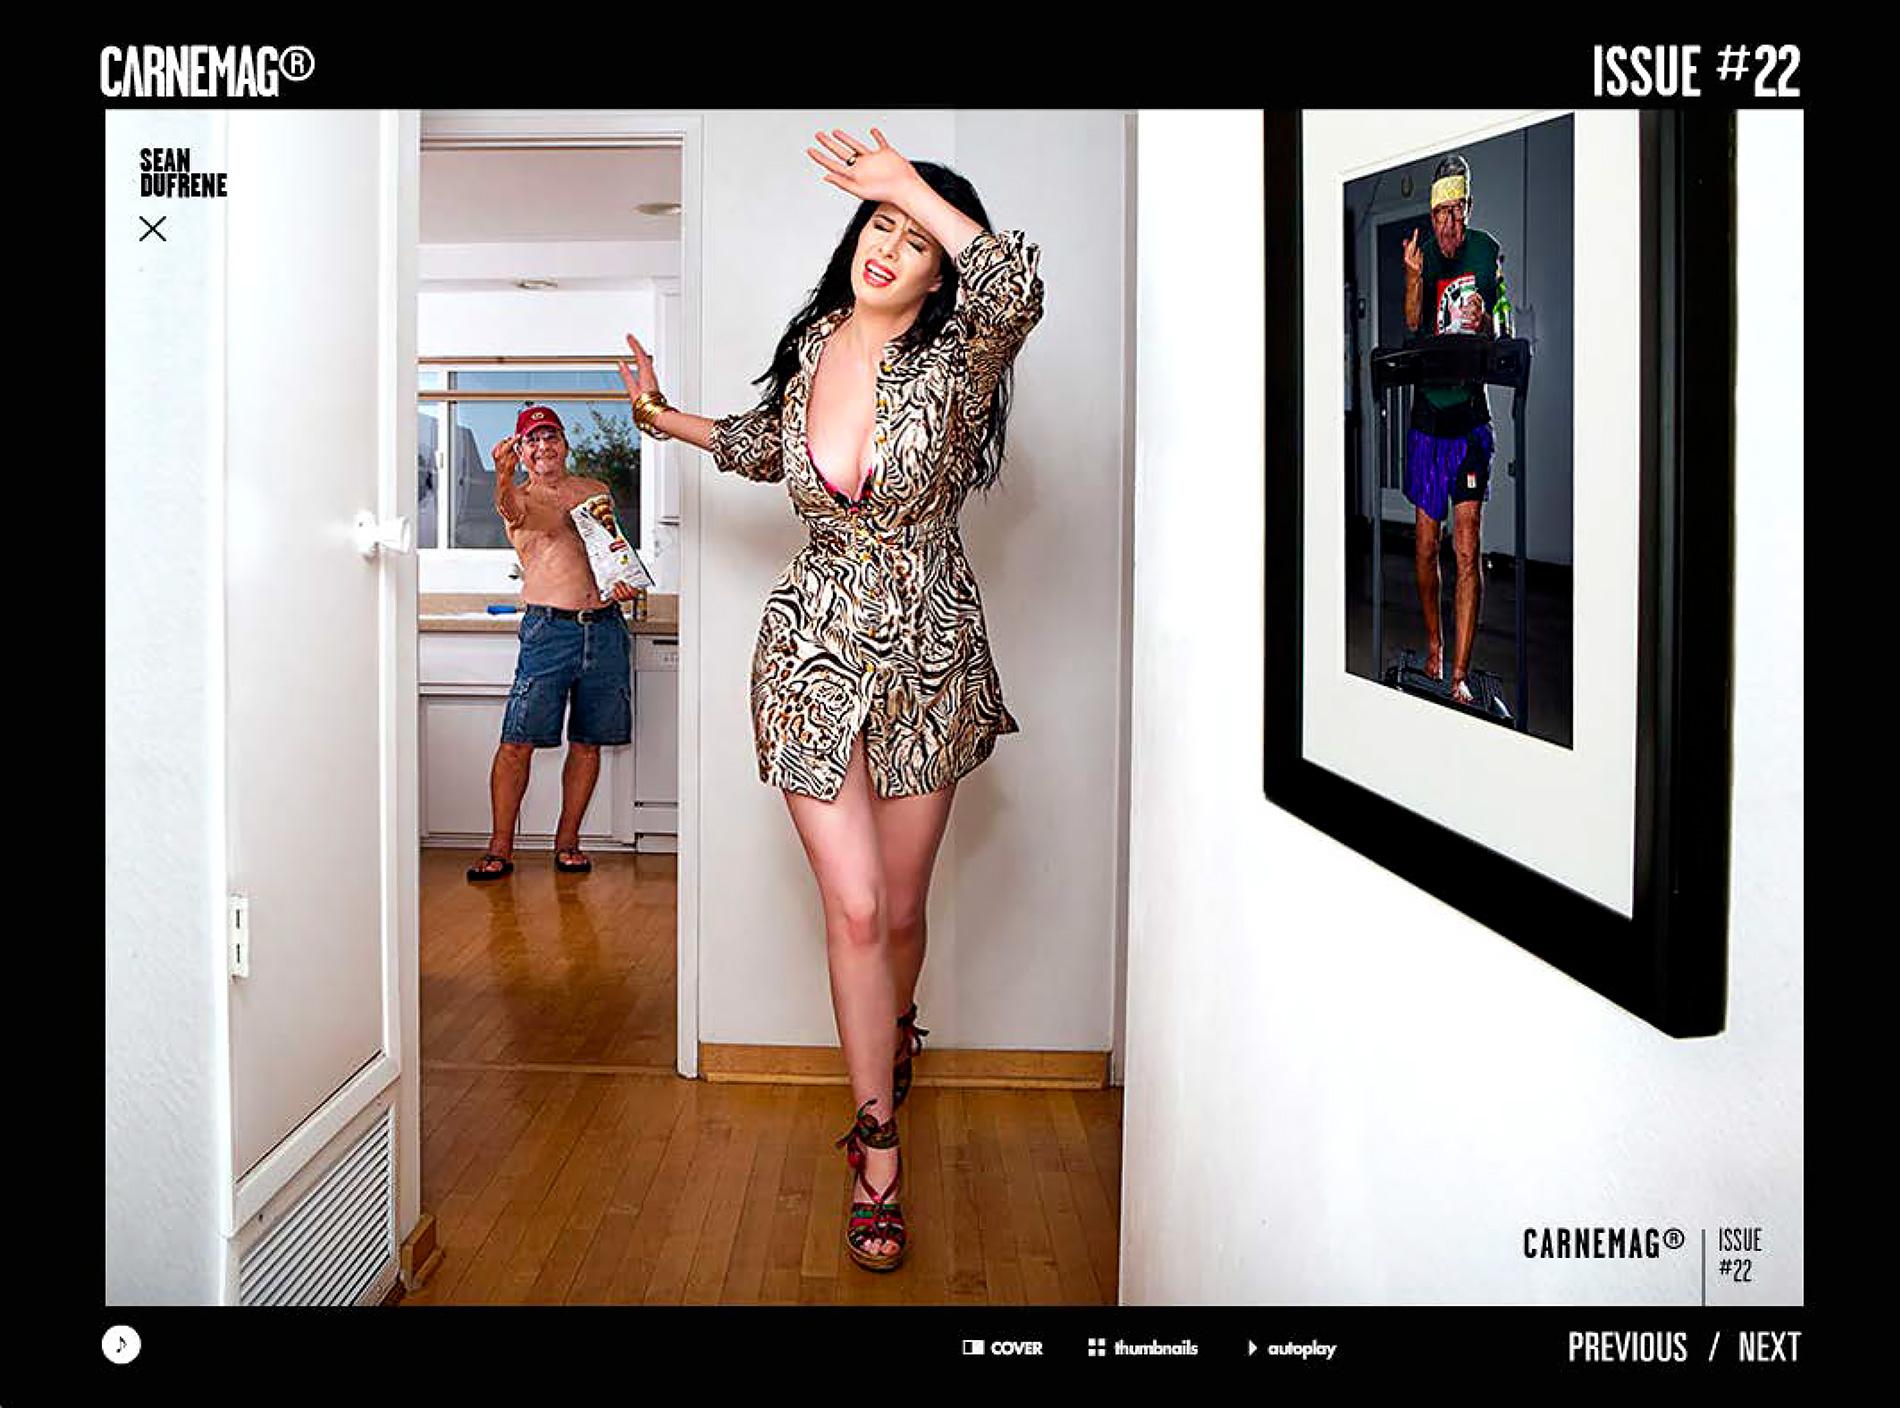 SD_CarneMag-Issue22-3.jpg